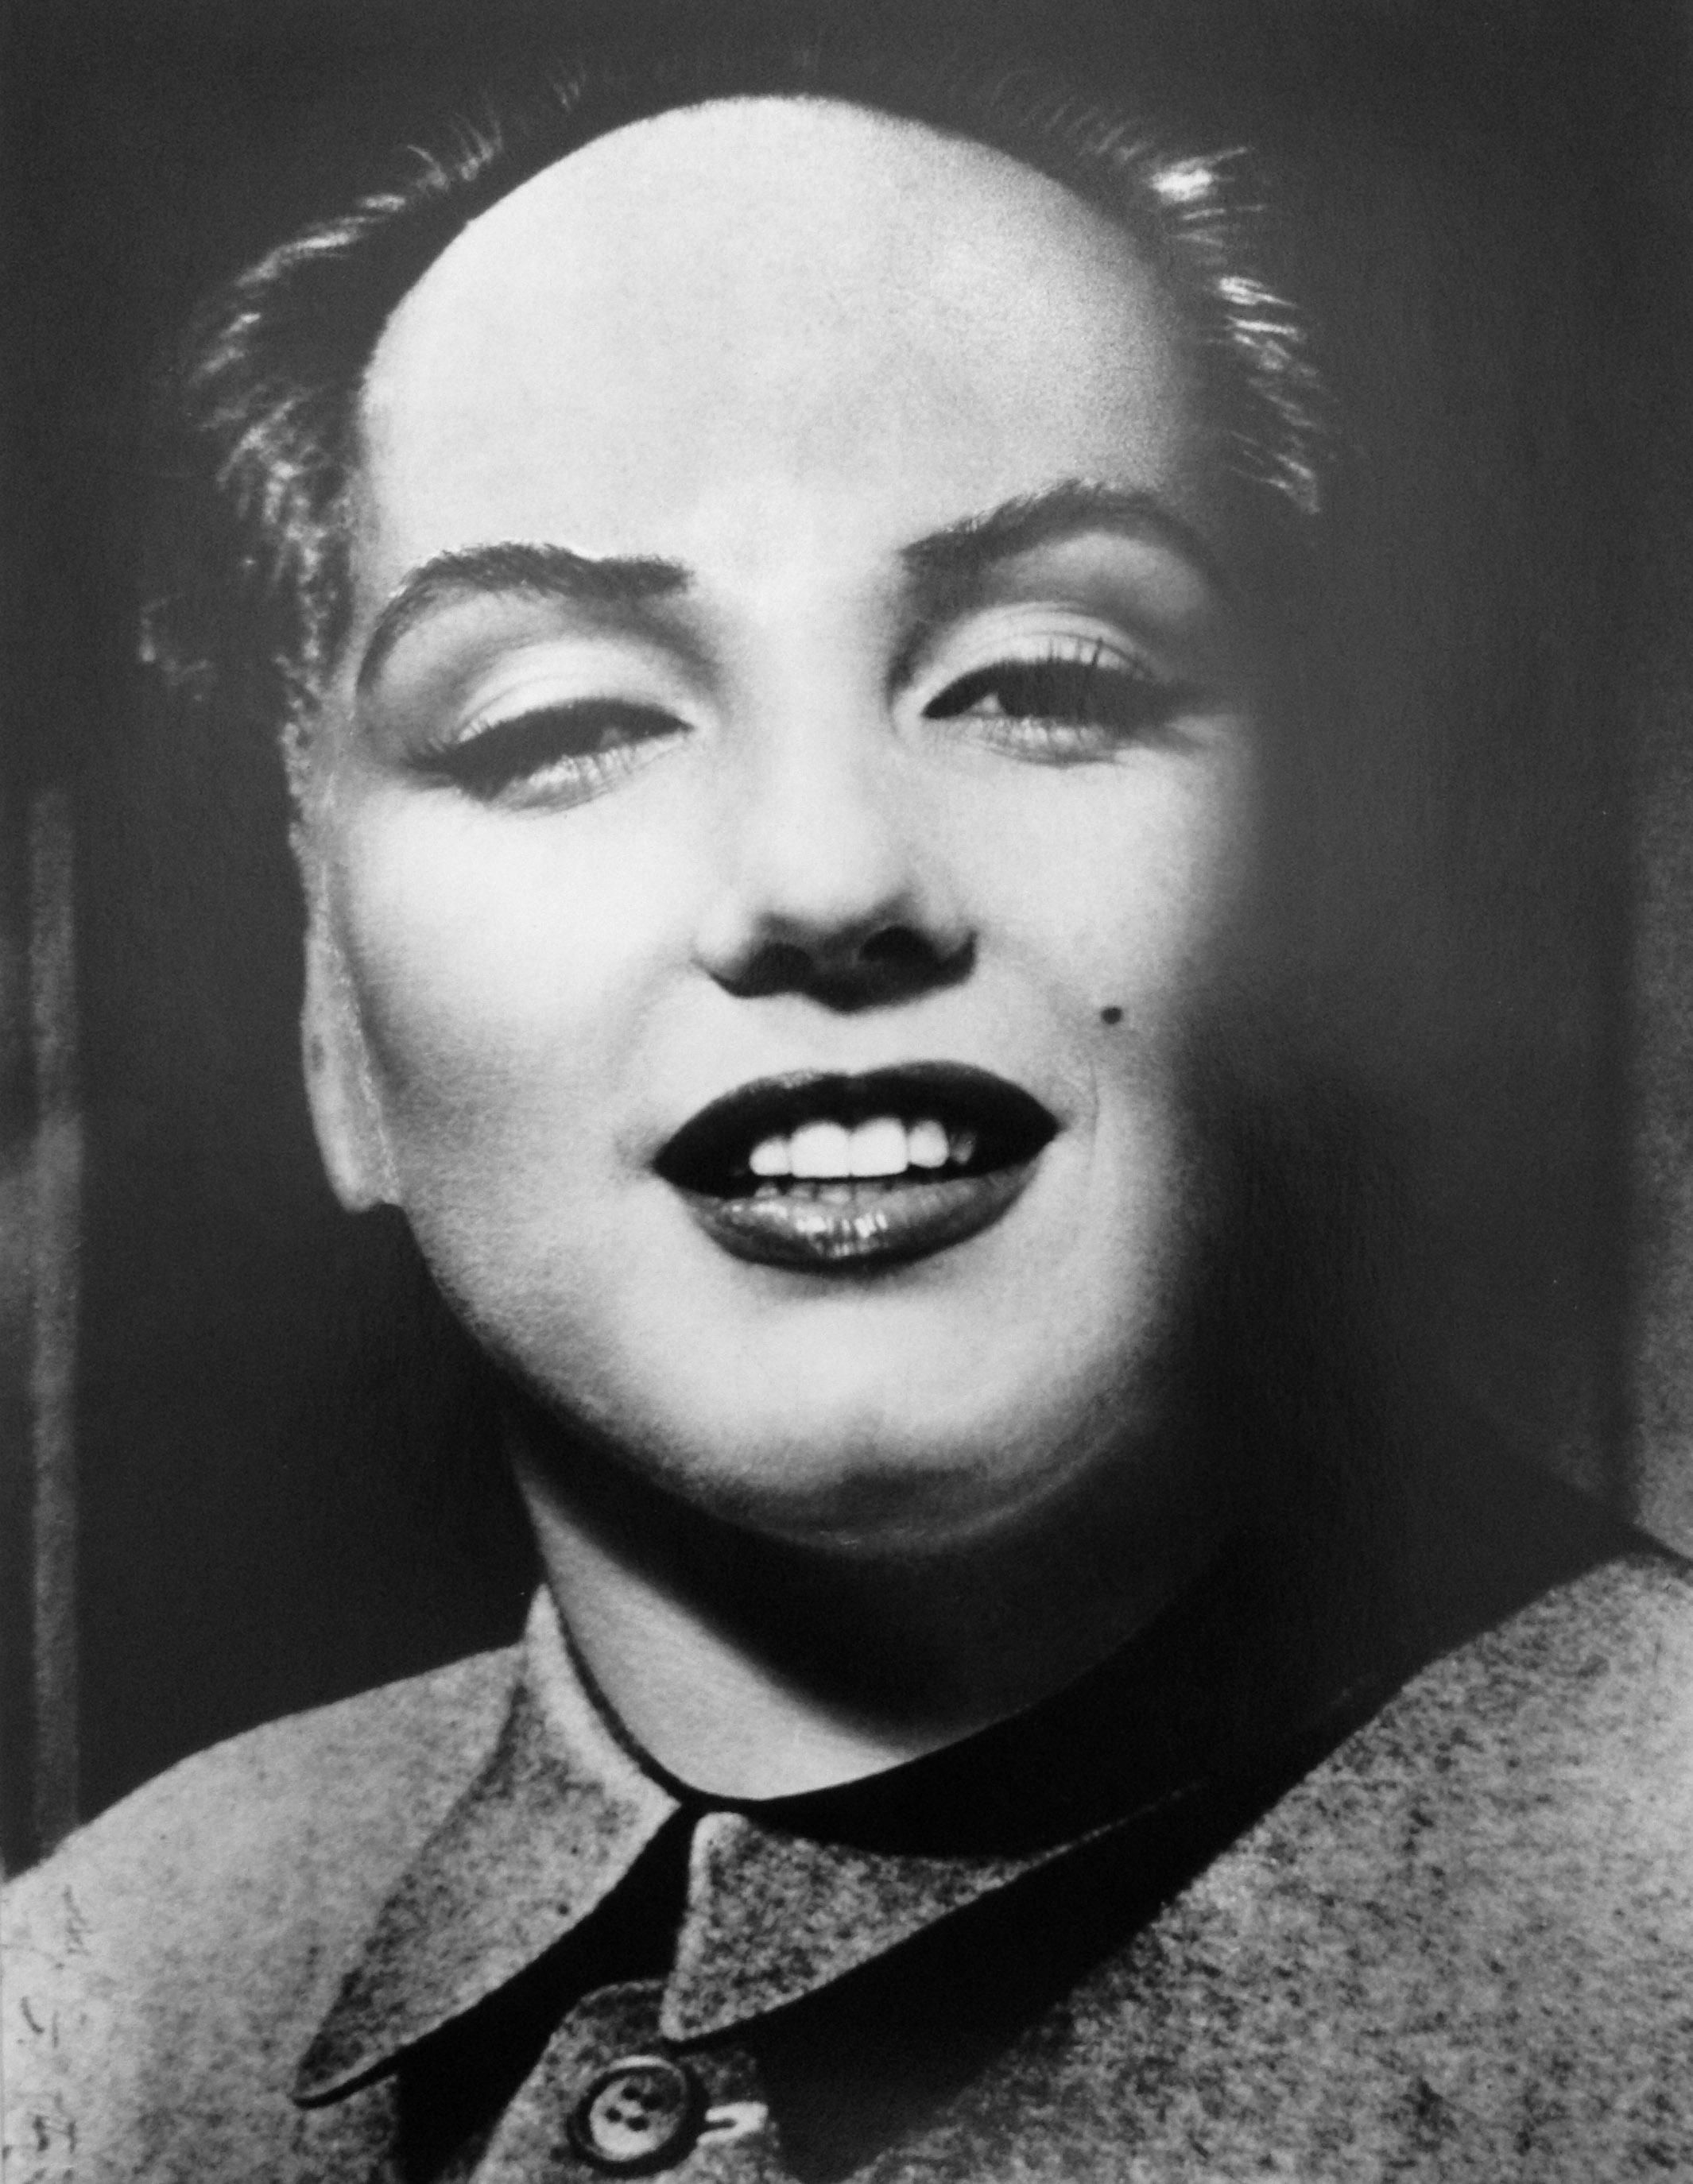 Marilyn Monroe As Chairman Mao Zedong By Dali Halsman Gelatin Uno Card Silver Print 1952